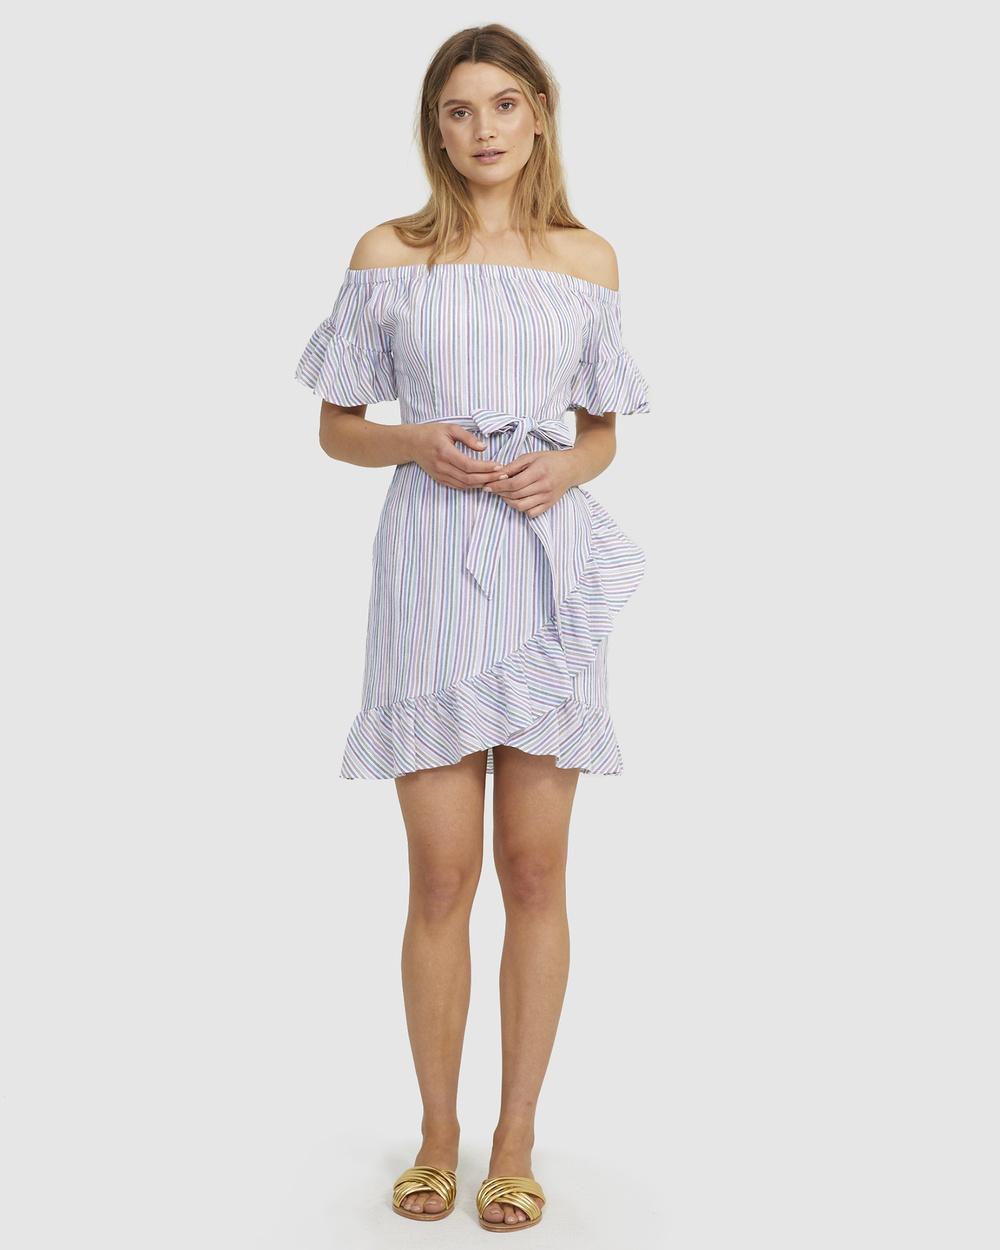 Cooper St Multi Bay Off The Shoulder Mini Dress